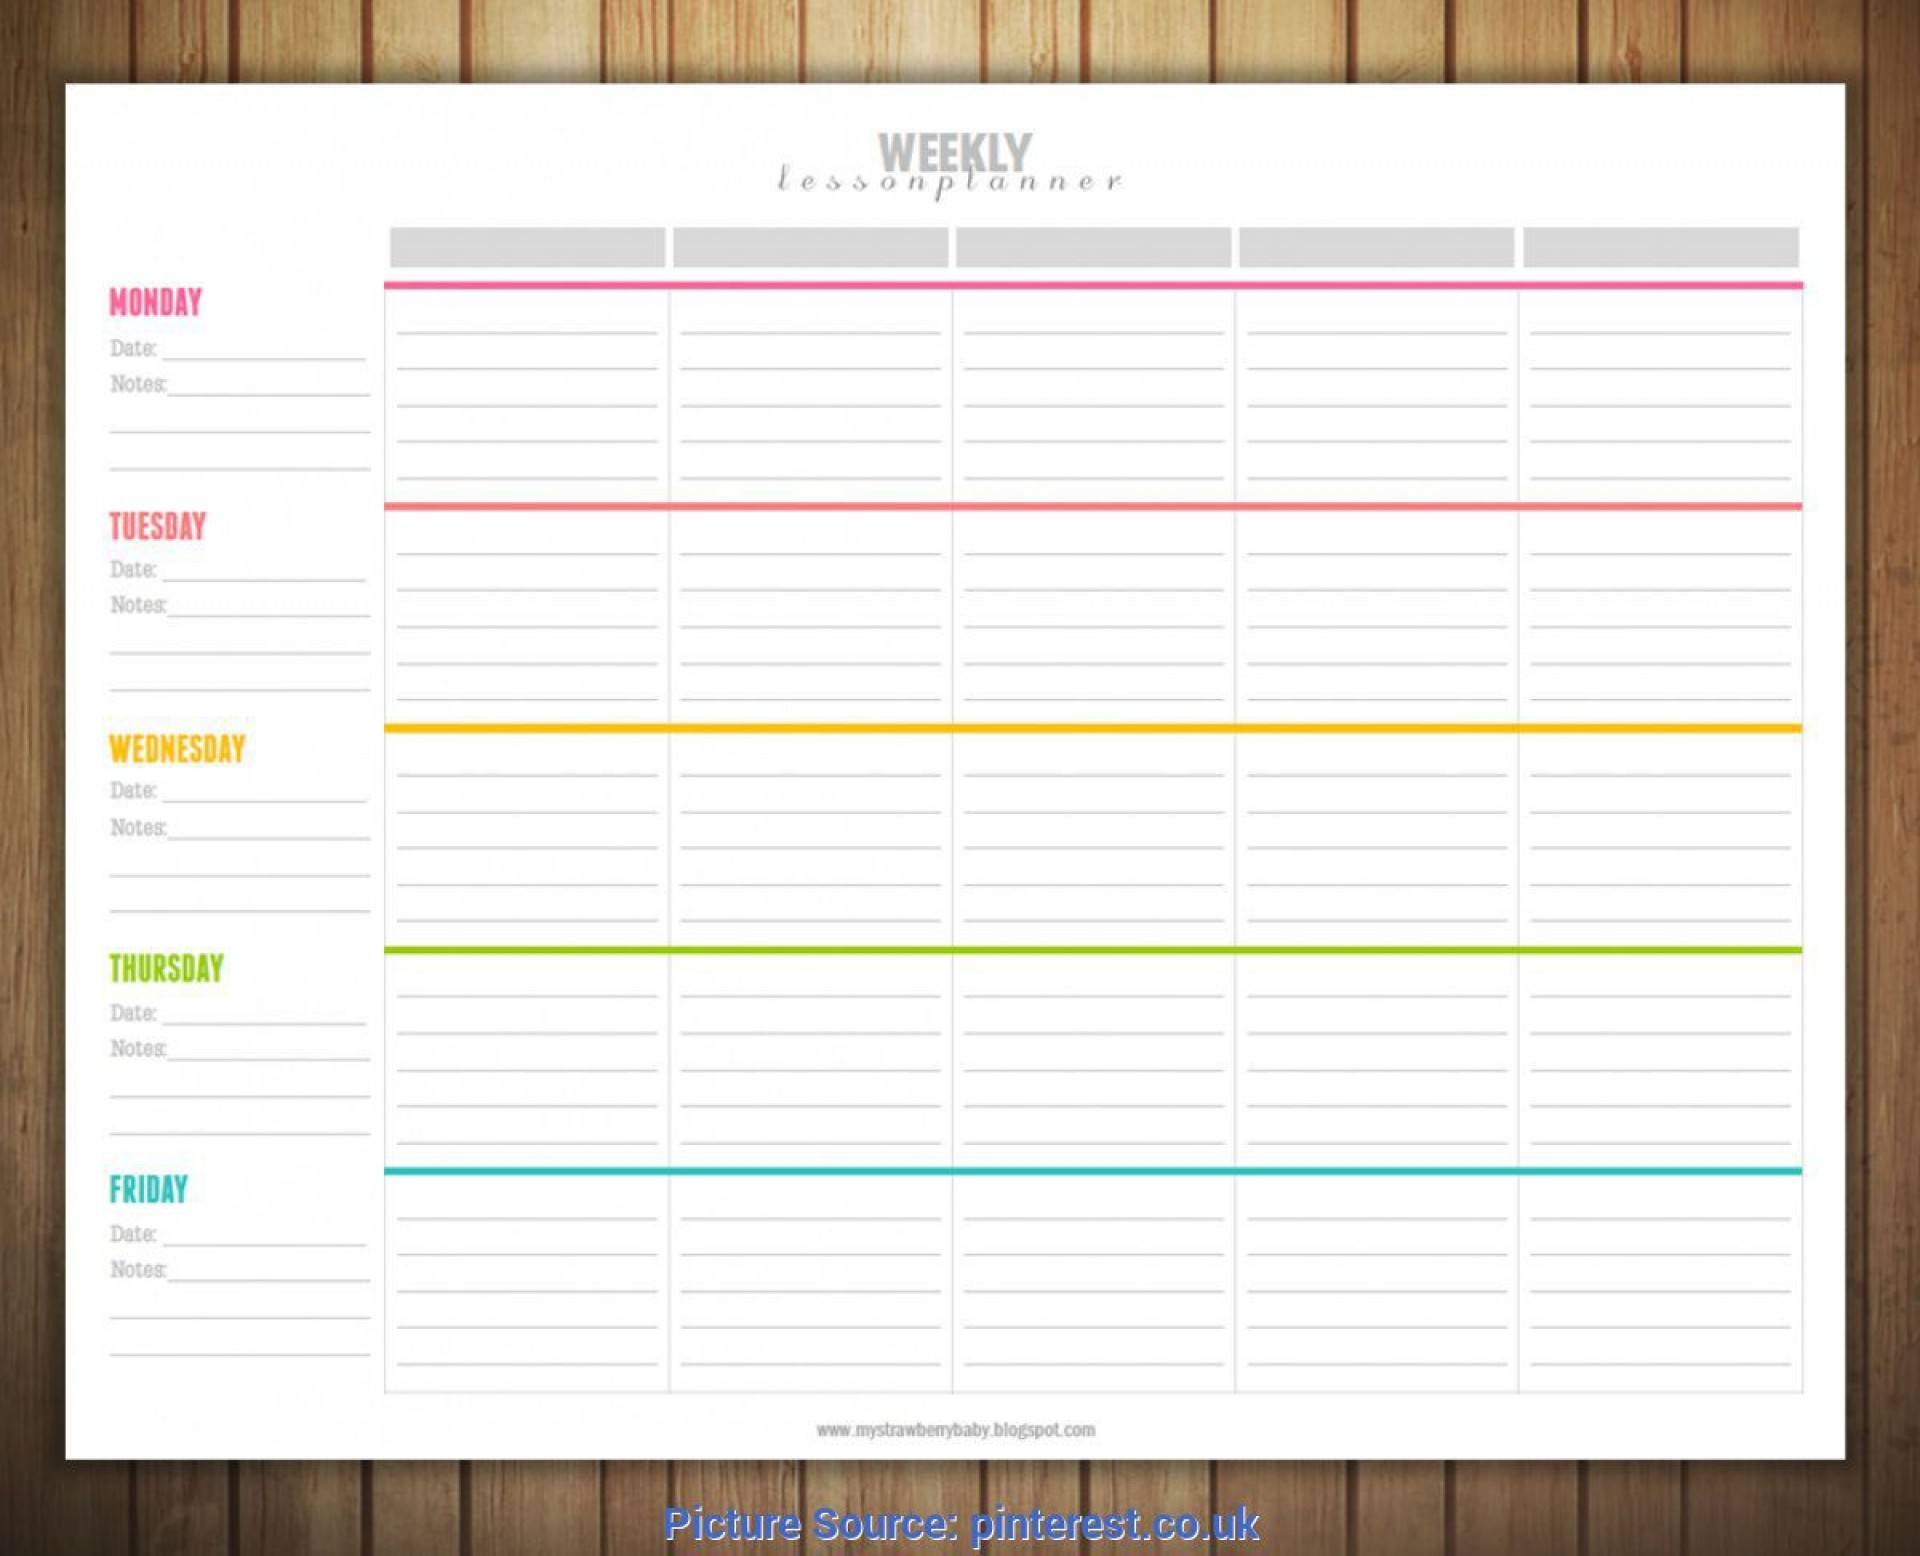 003 Unusual Free Blank Lesson Plan Template Pdf Idea  Weekly Editable1920